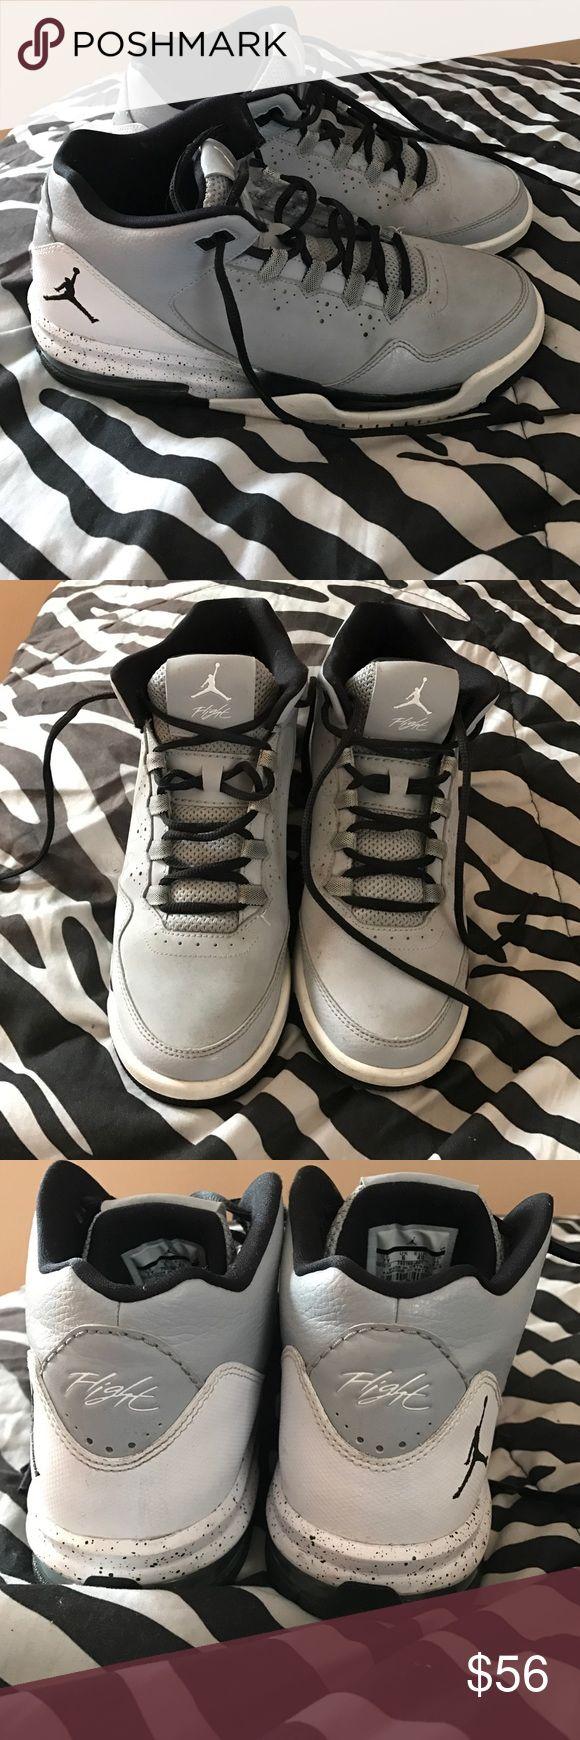 Big Cass Shoe Size